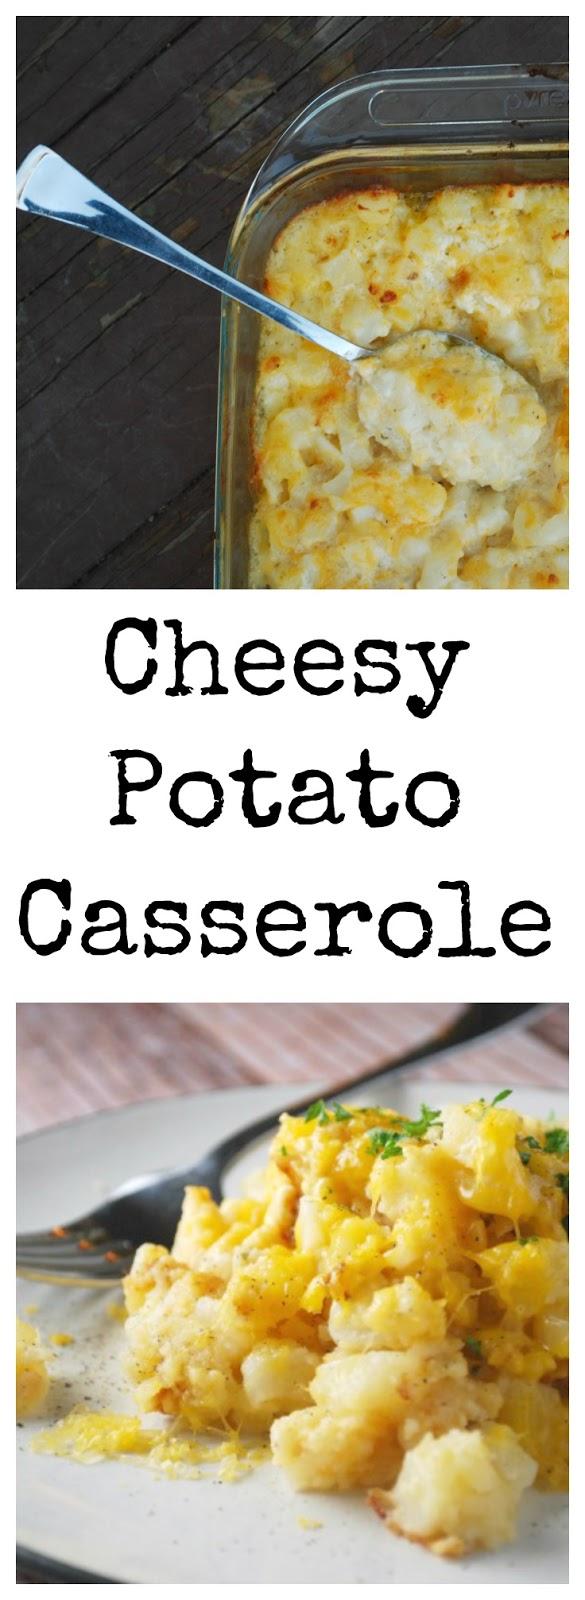 Cheesy Potato Casserole Holiday Side Dish